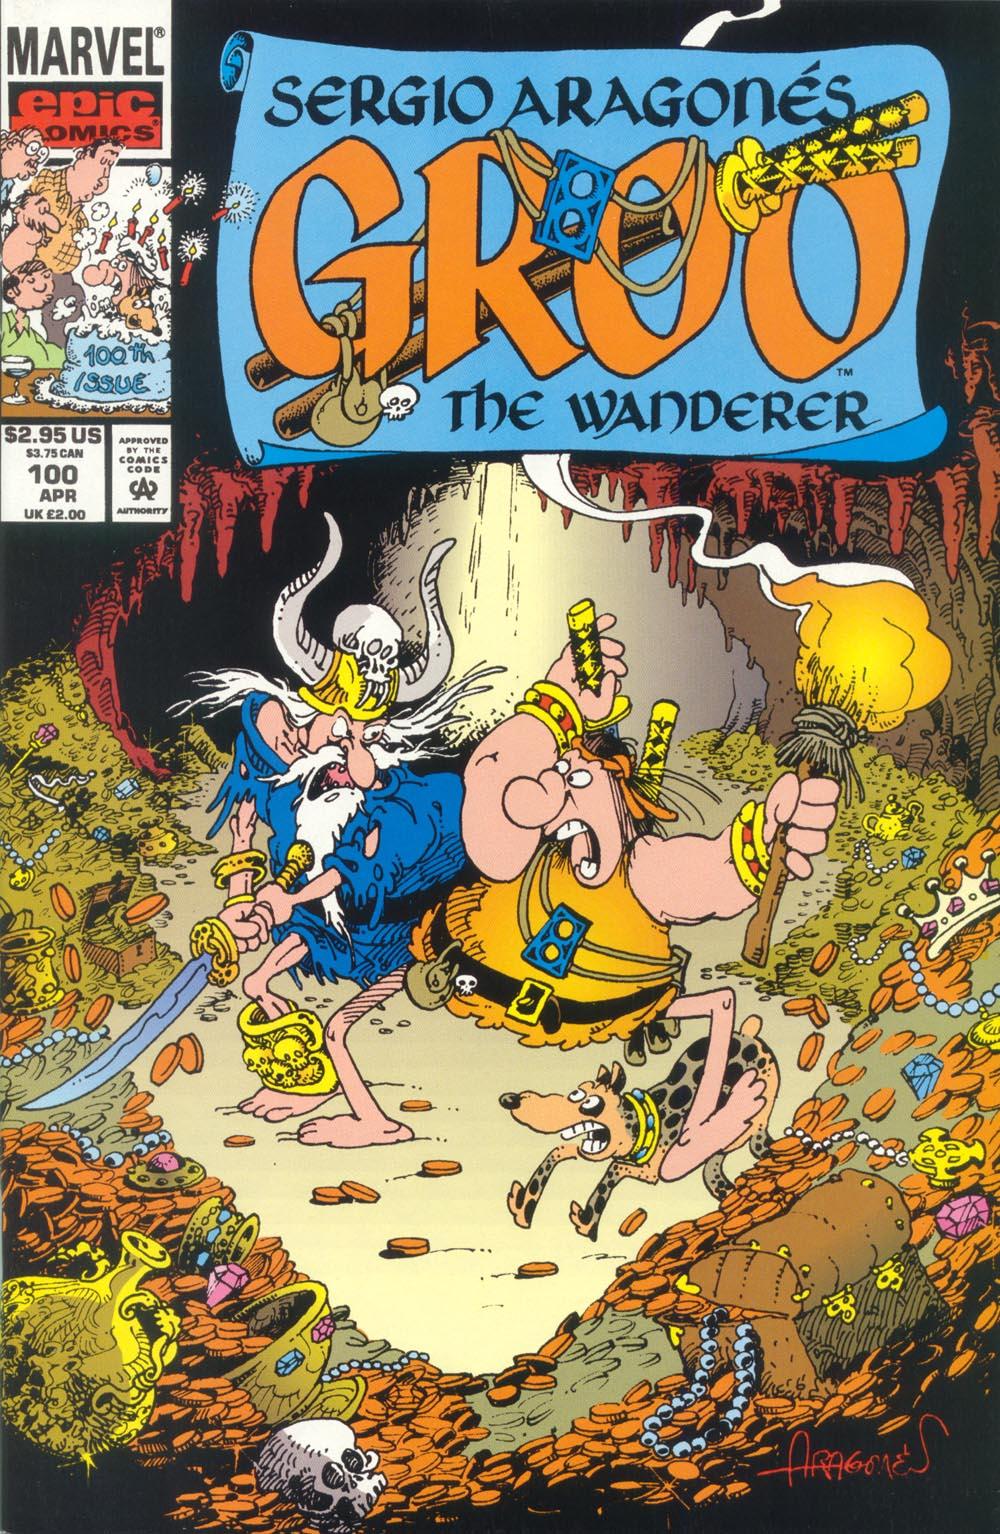 Read online Sergio Aragonés Groo the Wanderer comic -  Issue #100 - 1